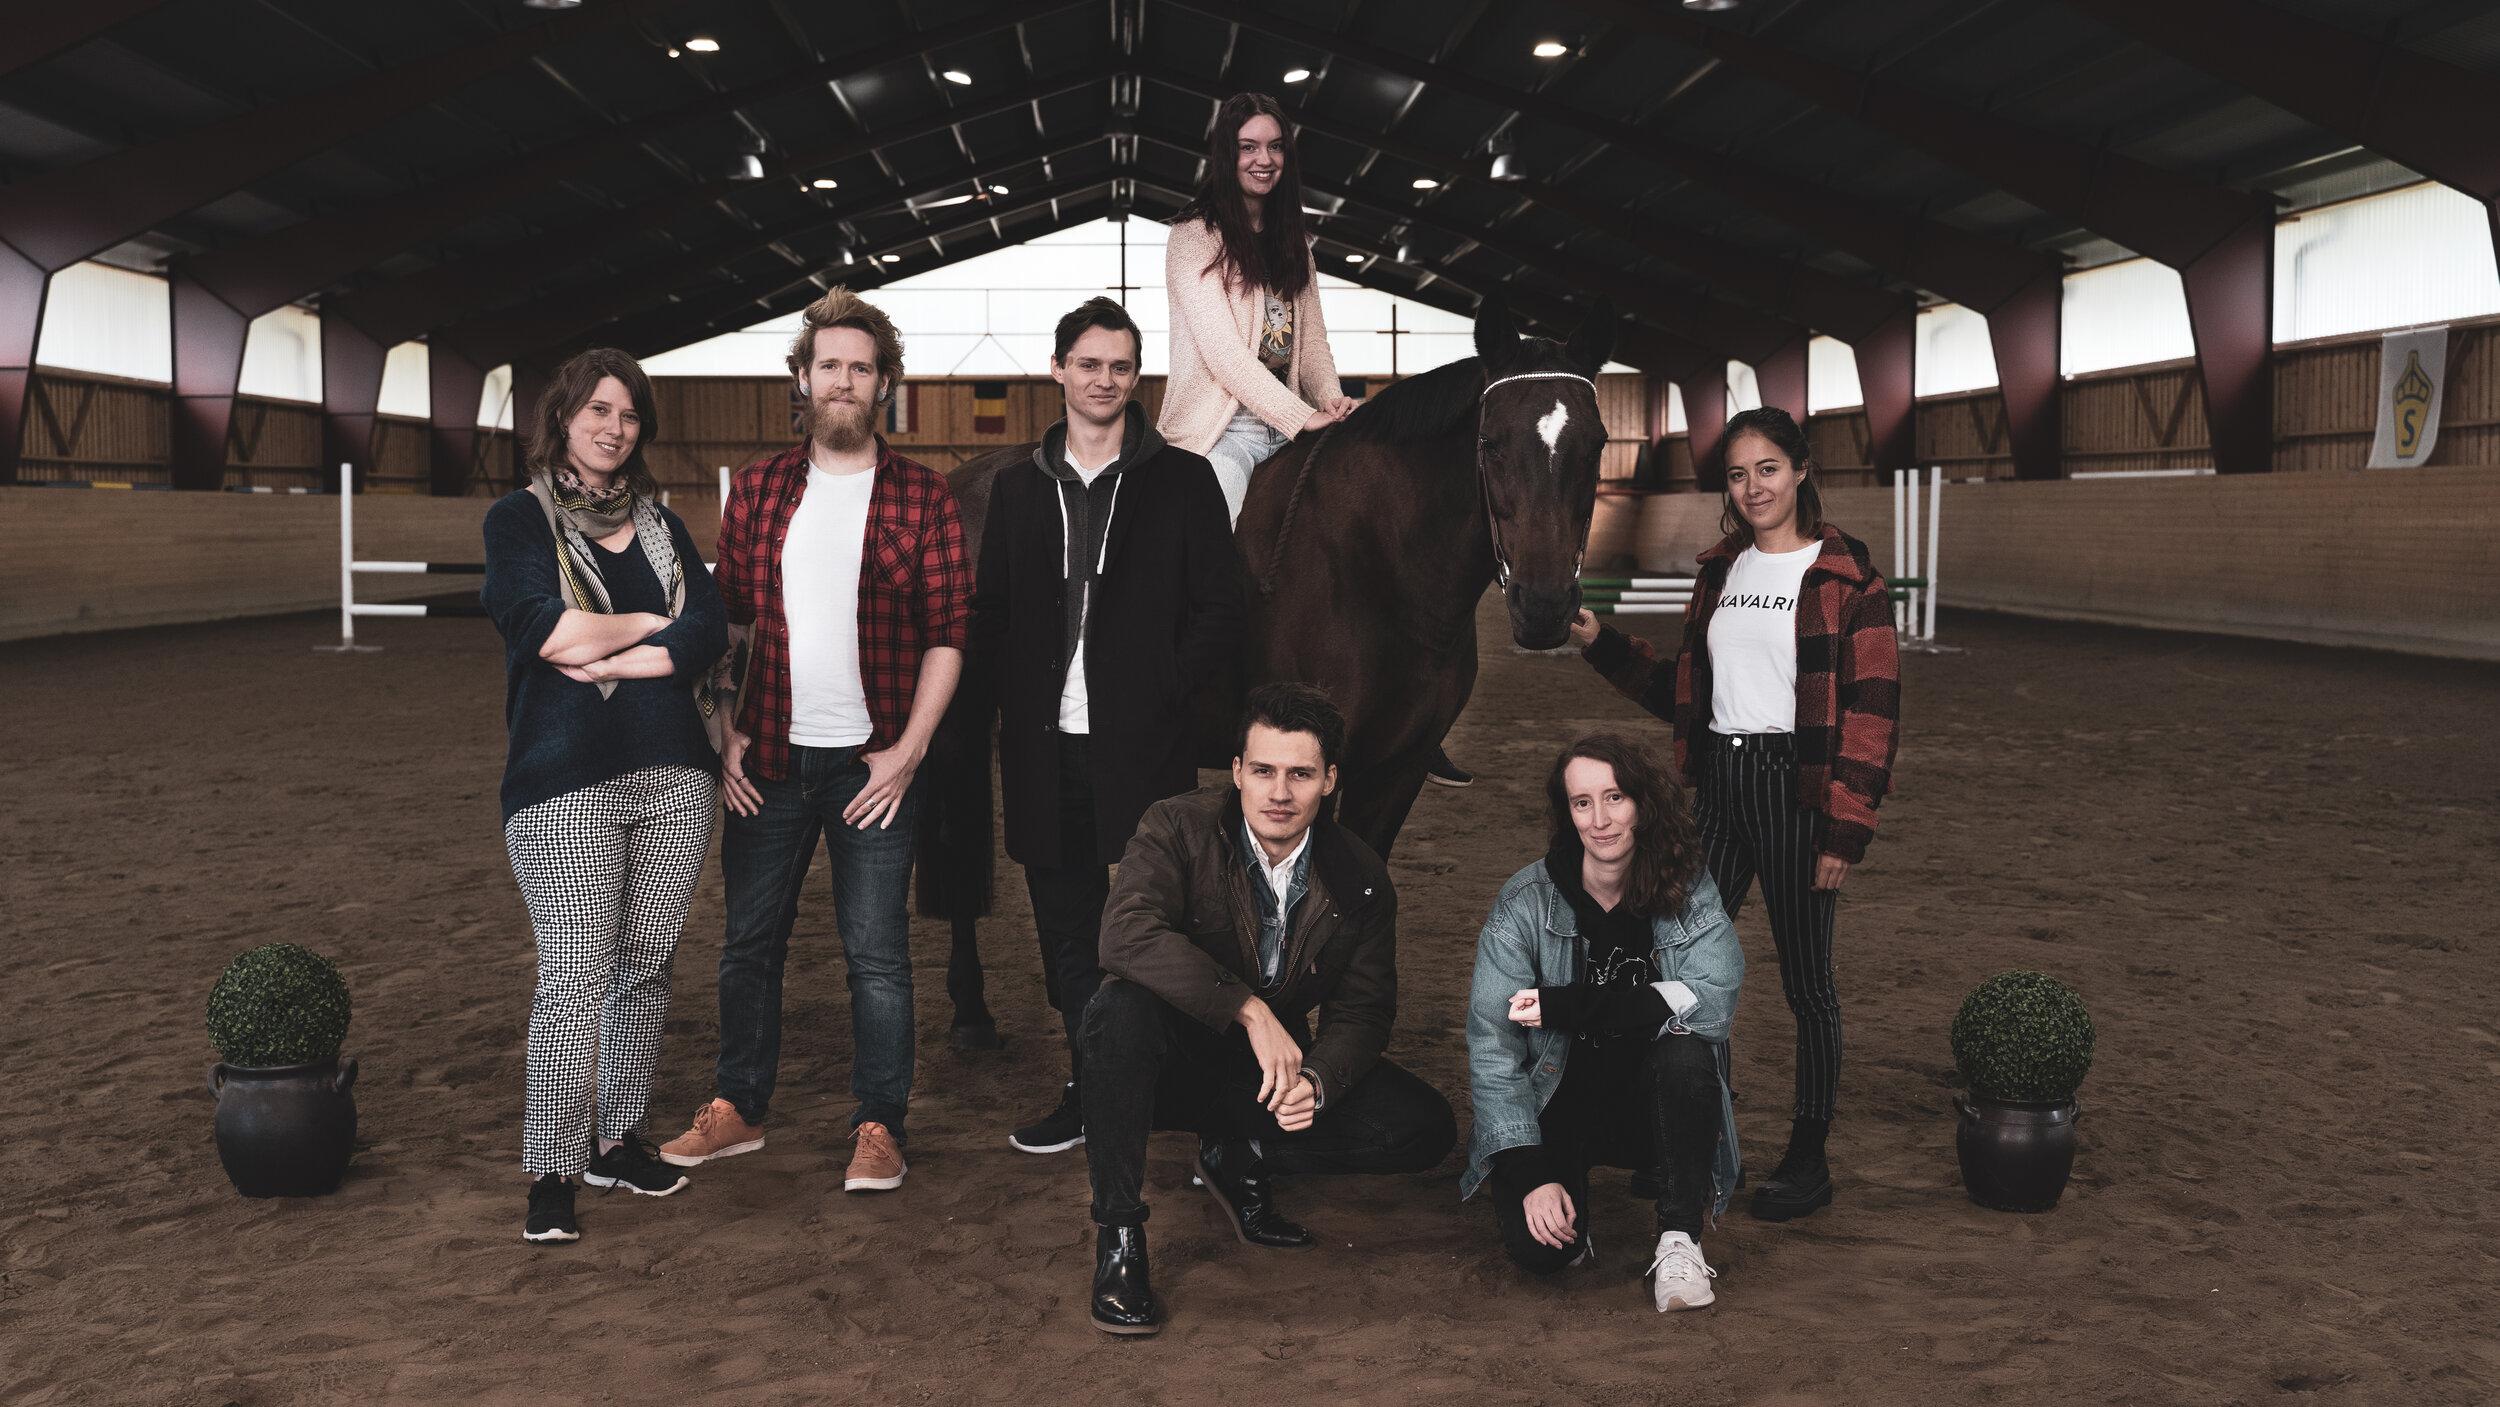 We love games… - We love horses